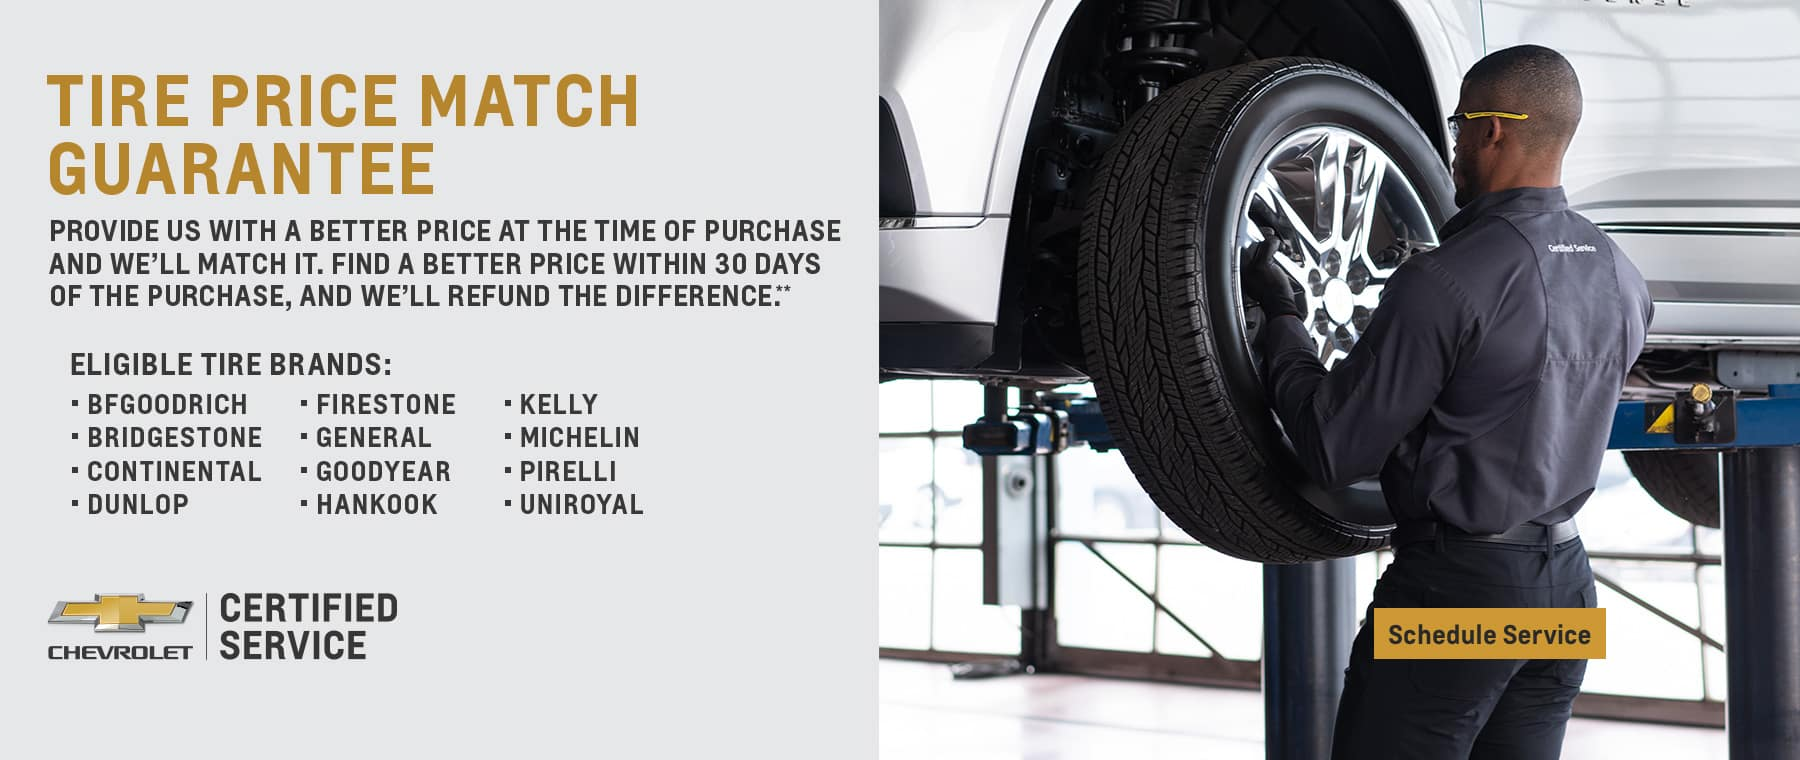 Tire Price Matching Guarantee